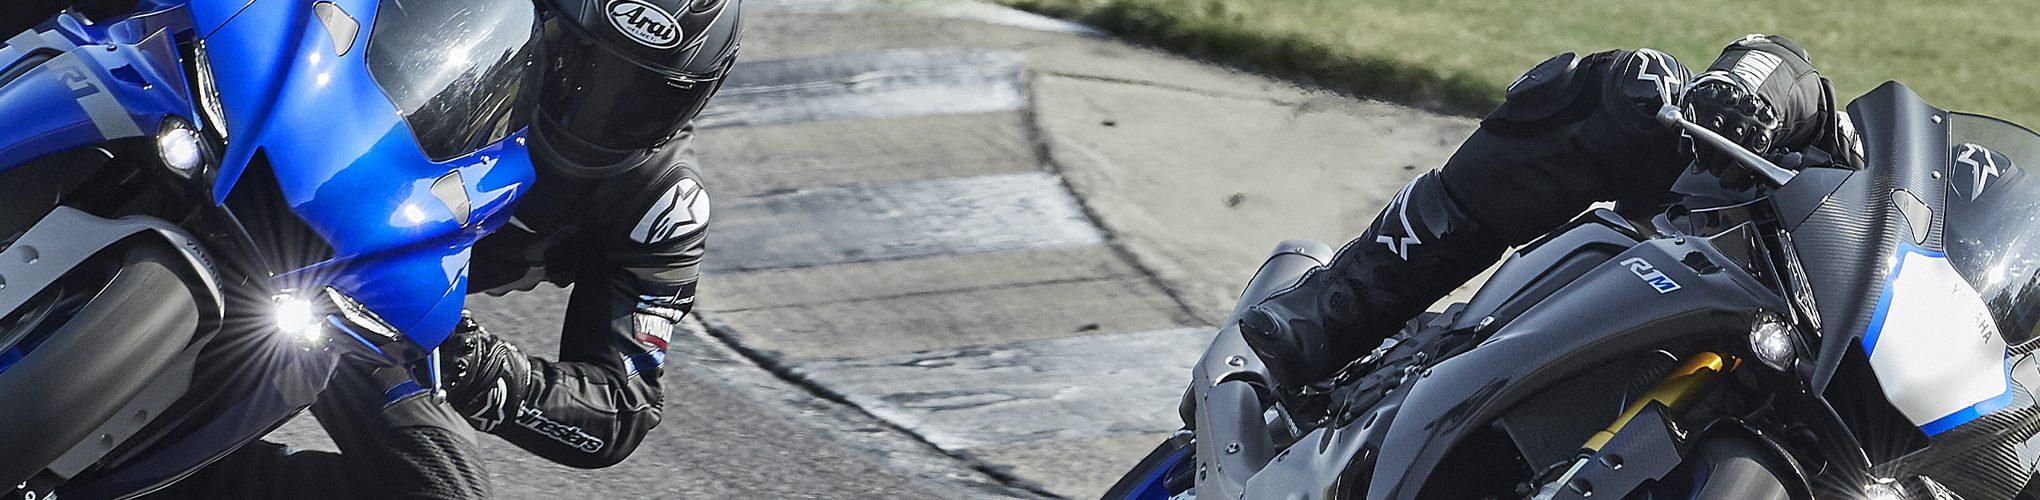 Yamaha YZF-R1 | MotorCentrumWest